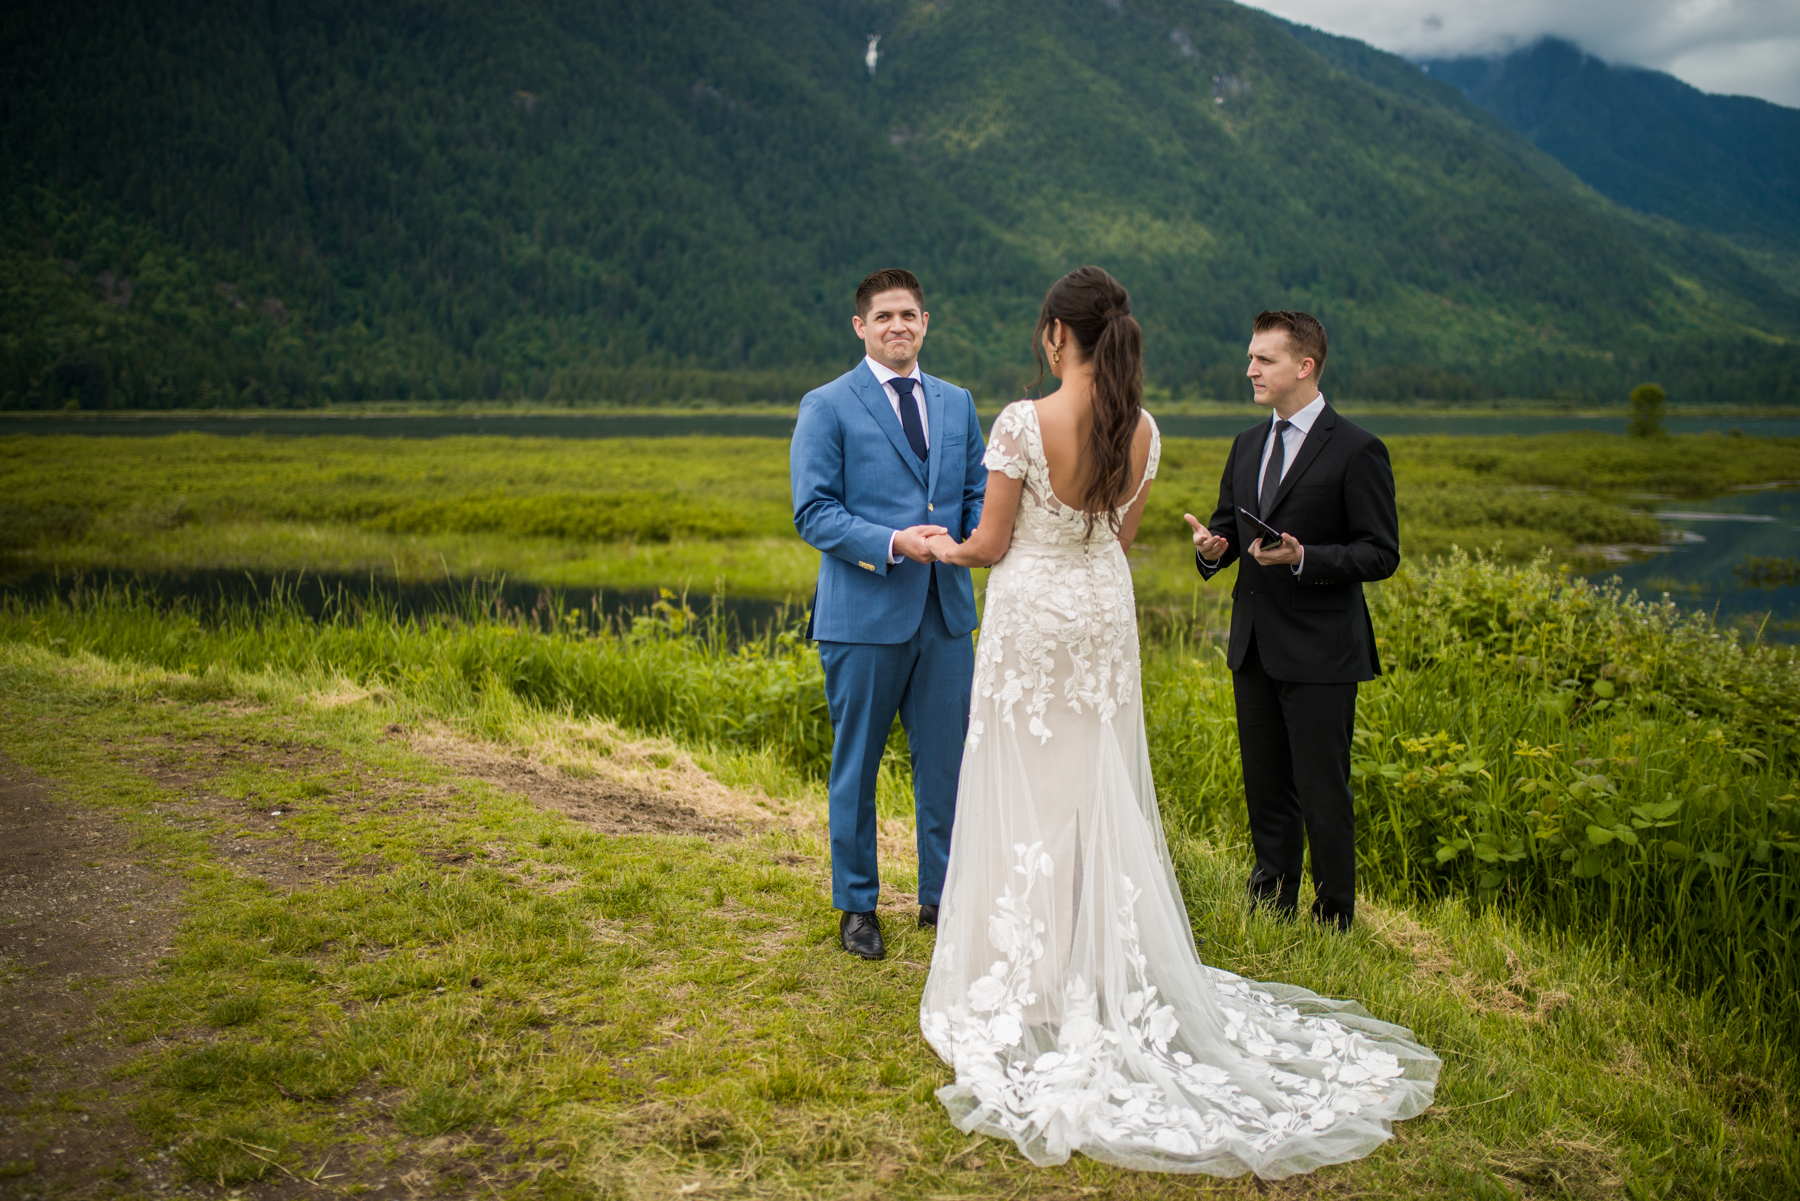 dp-wedding-web-060